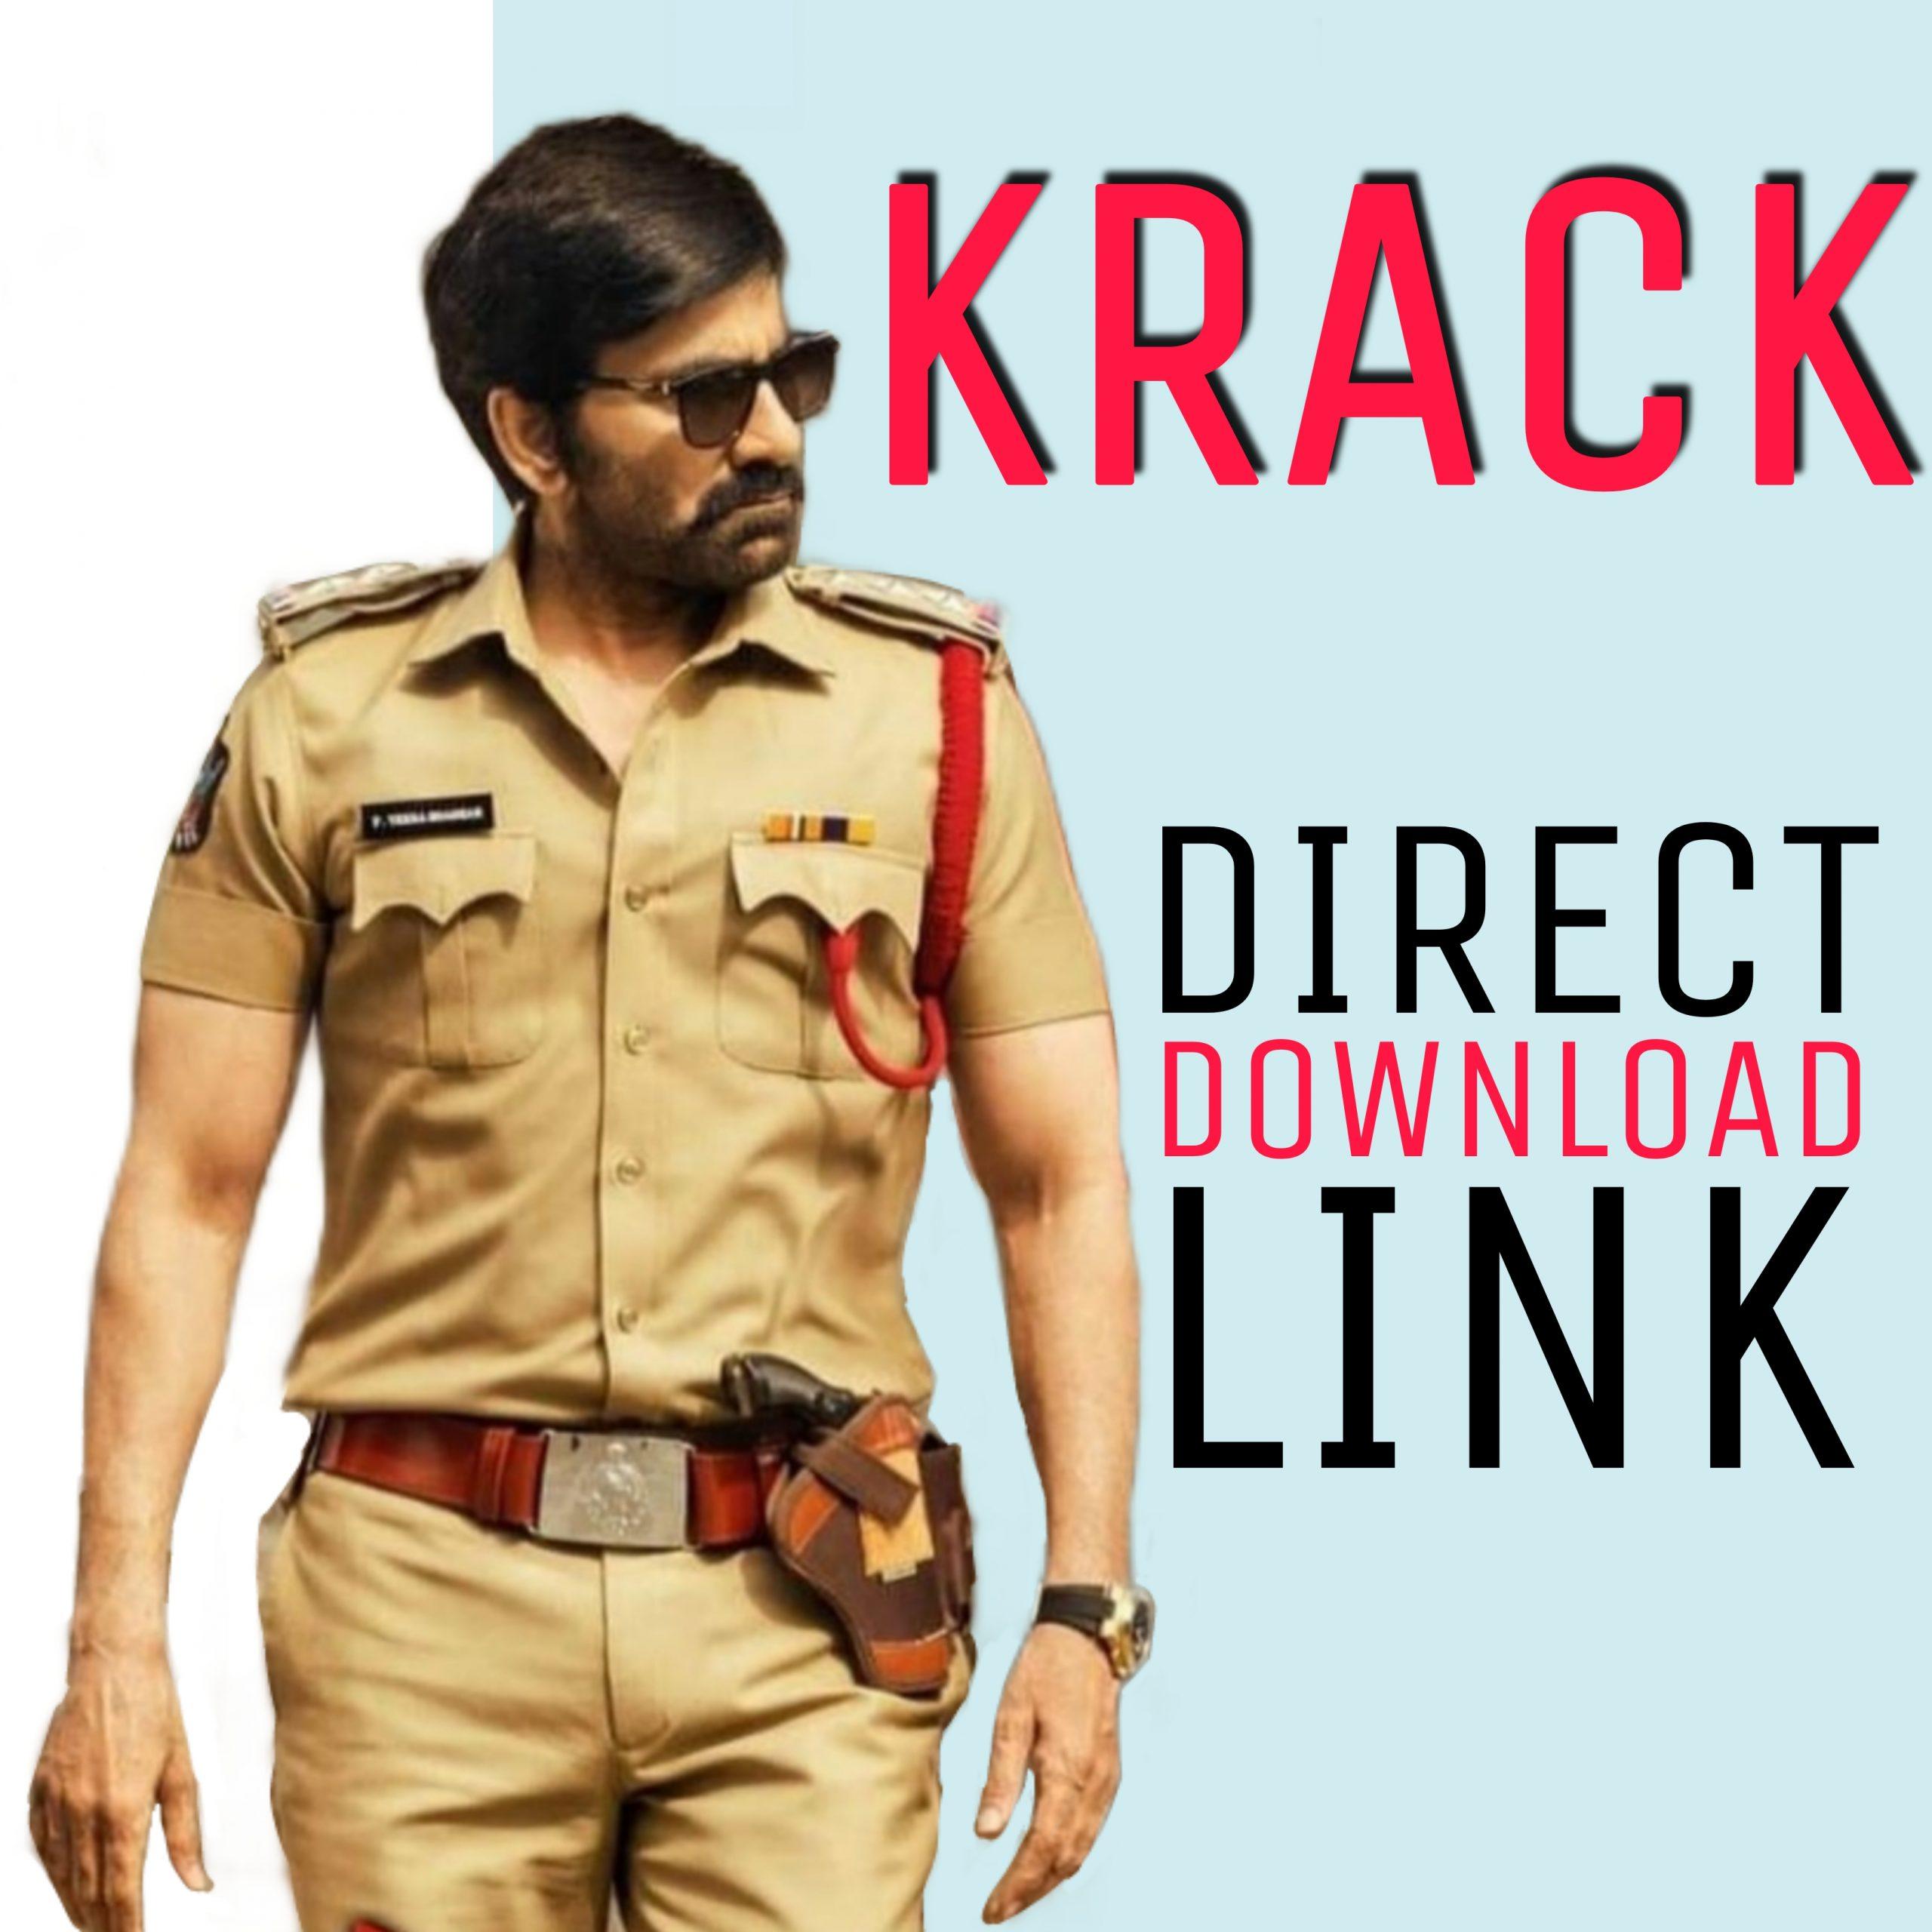 krack full movie in hindi download mp4moviez